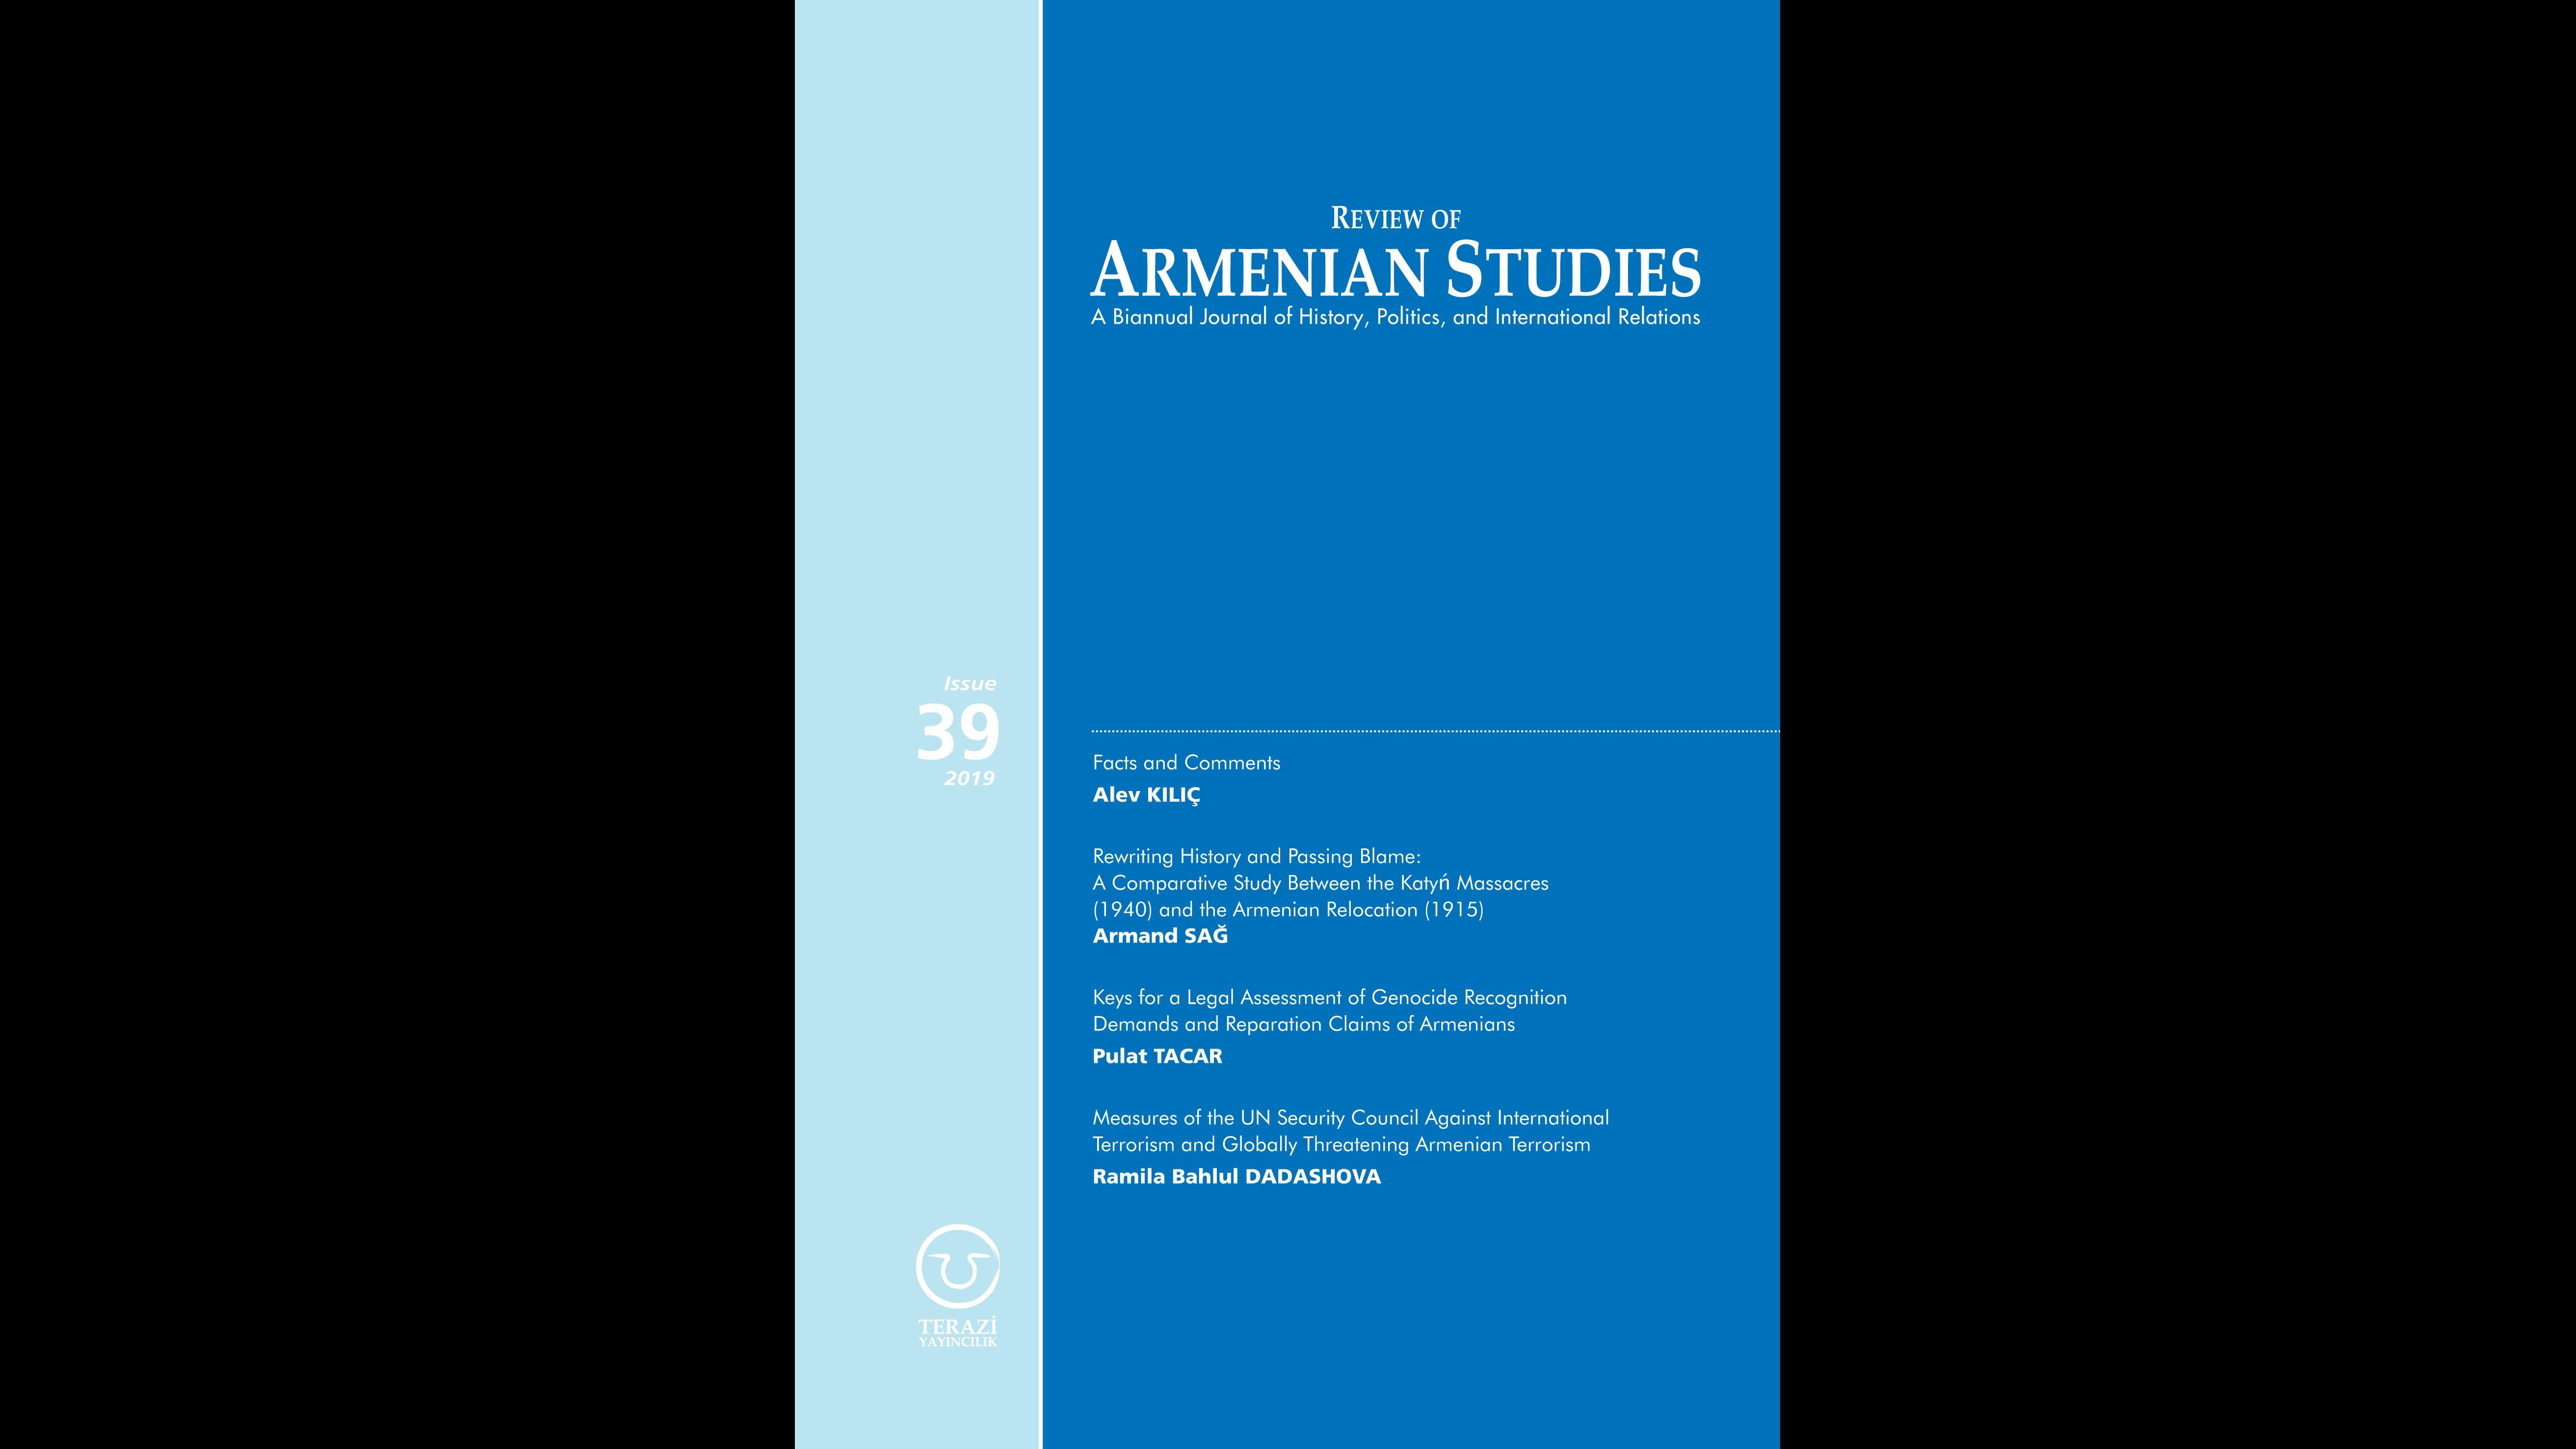 DUYURU: REVIEW OF ARMENIAN STUDIES DERGİSİNİN 39'UNCU SAYISI YAYINLANDI